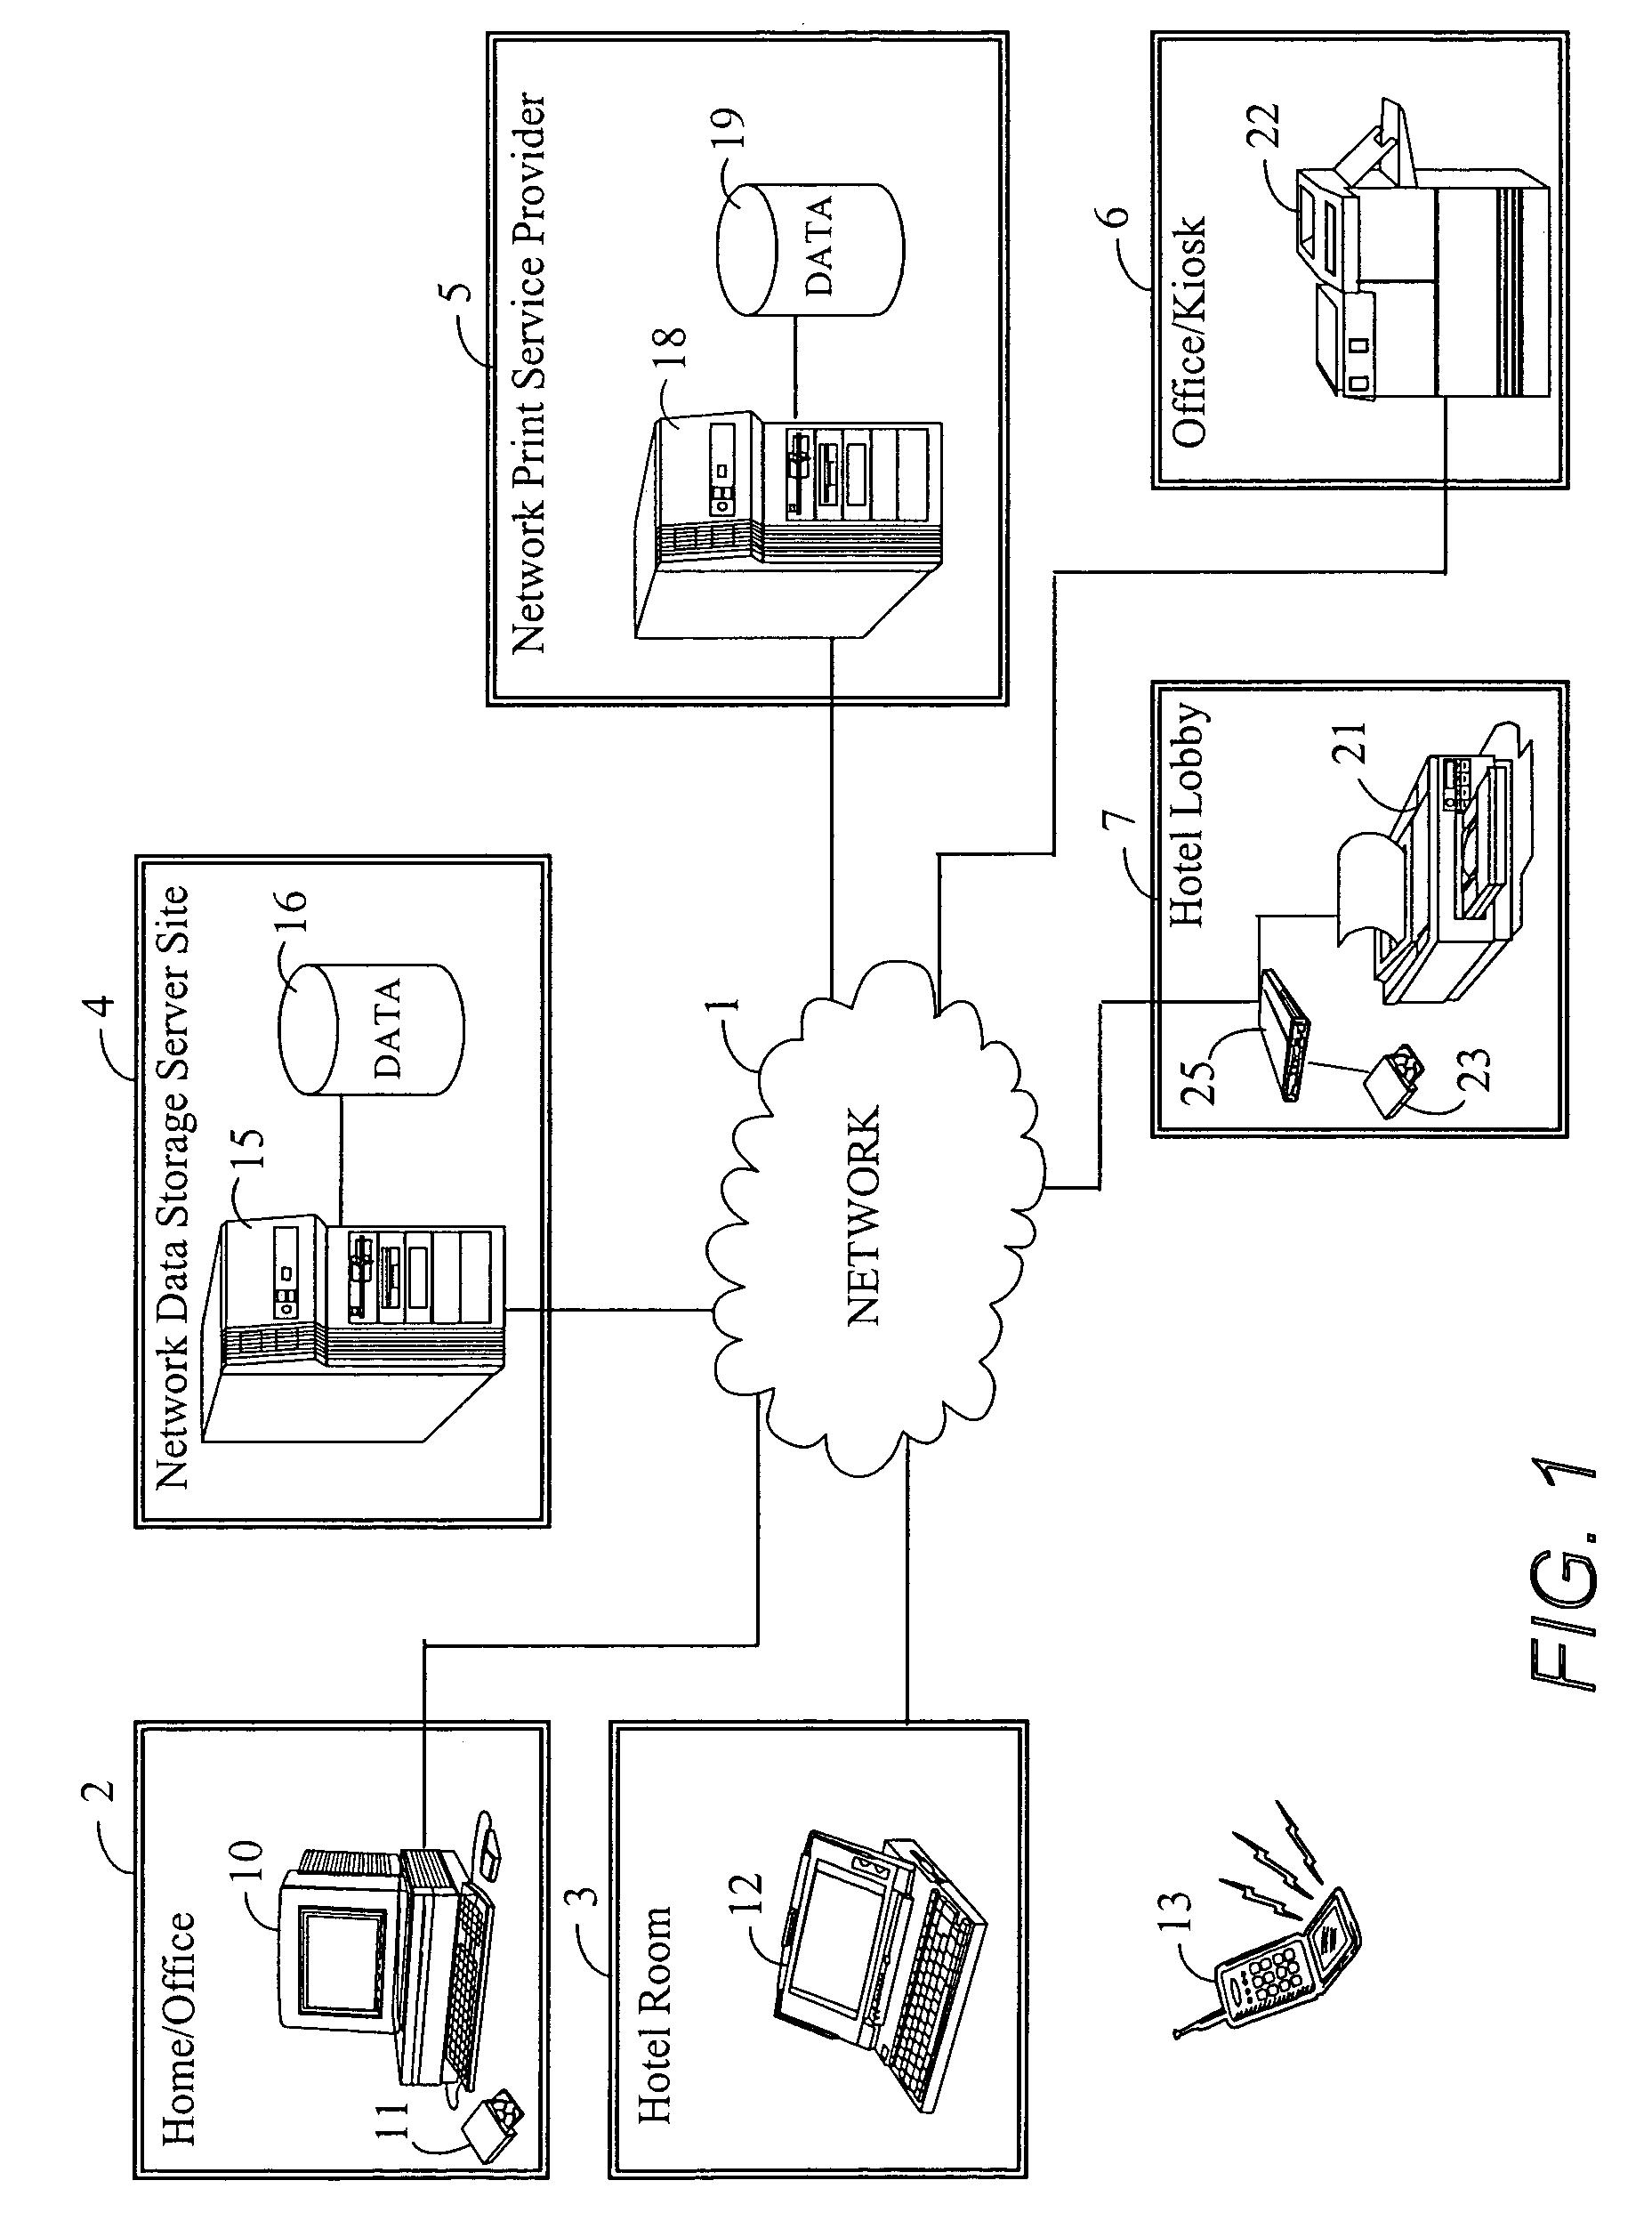 cencom siren wiring diagram wiring diagram